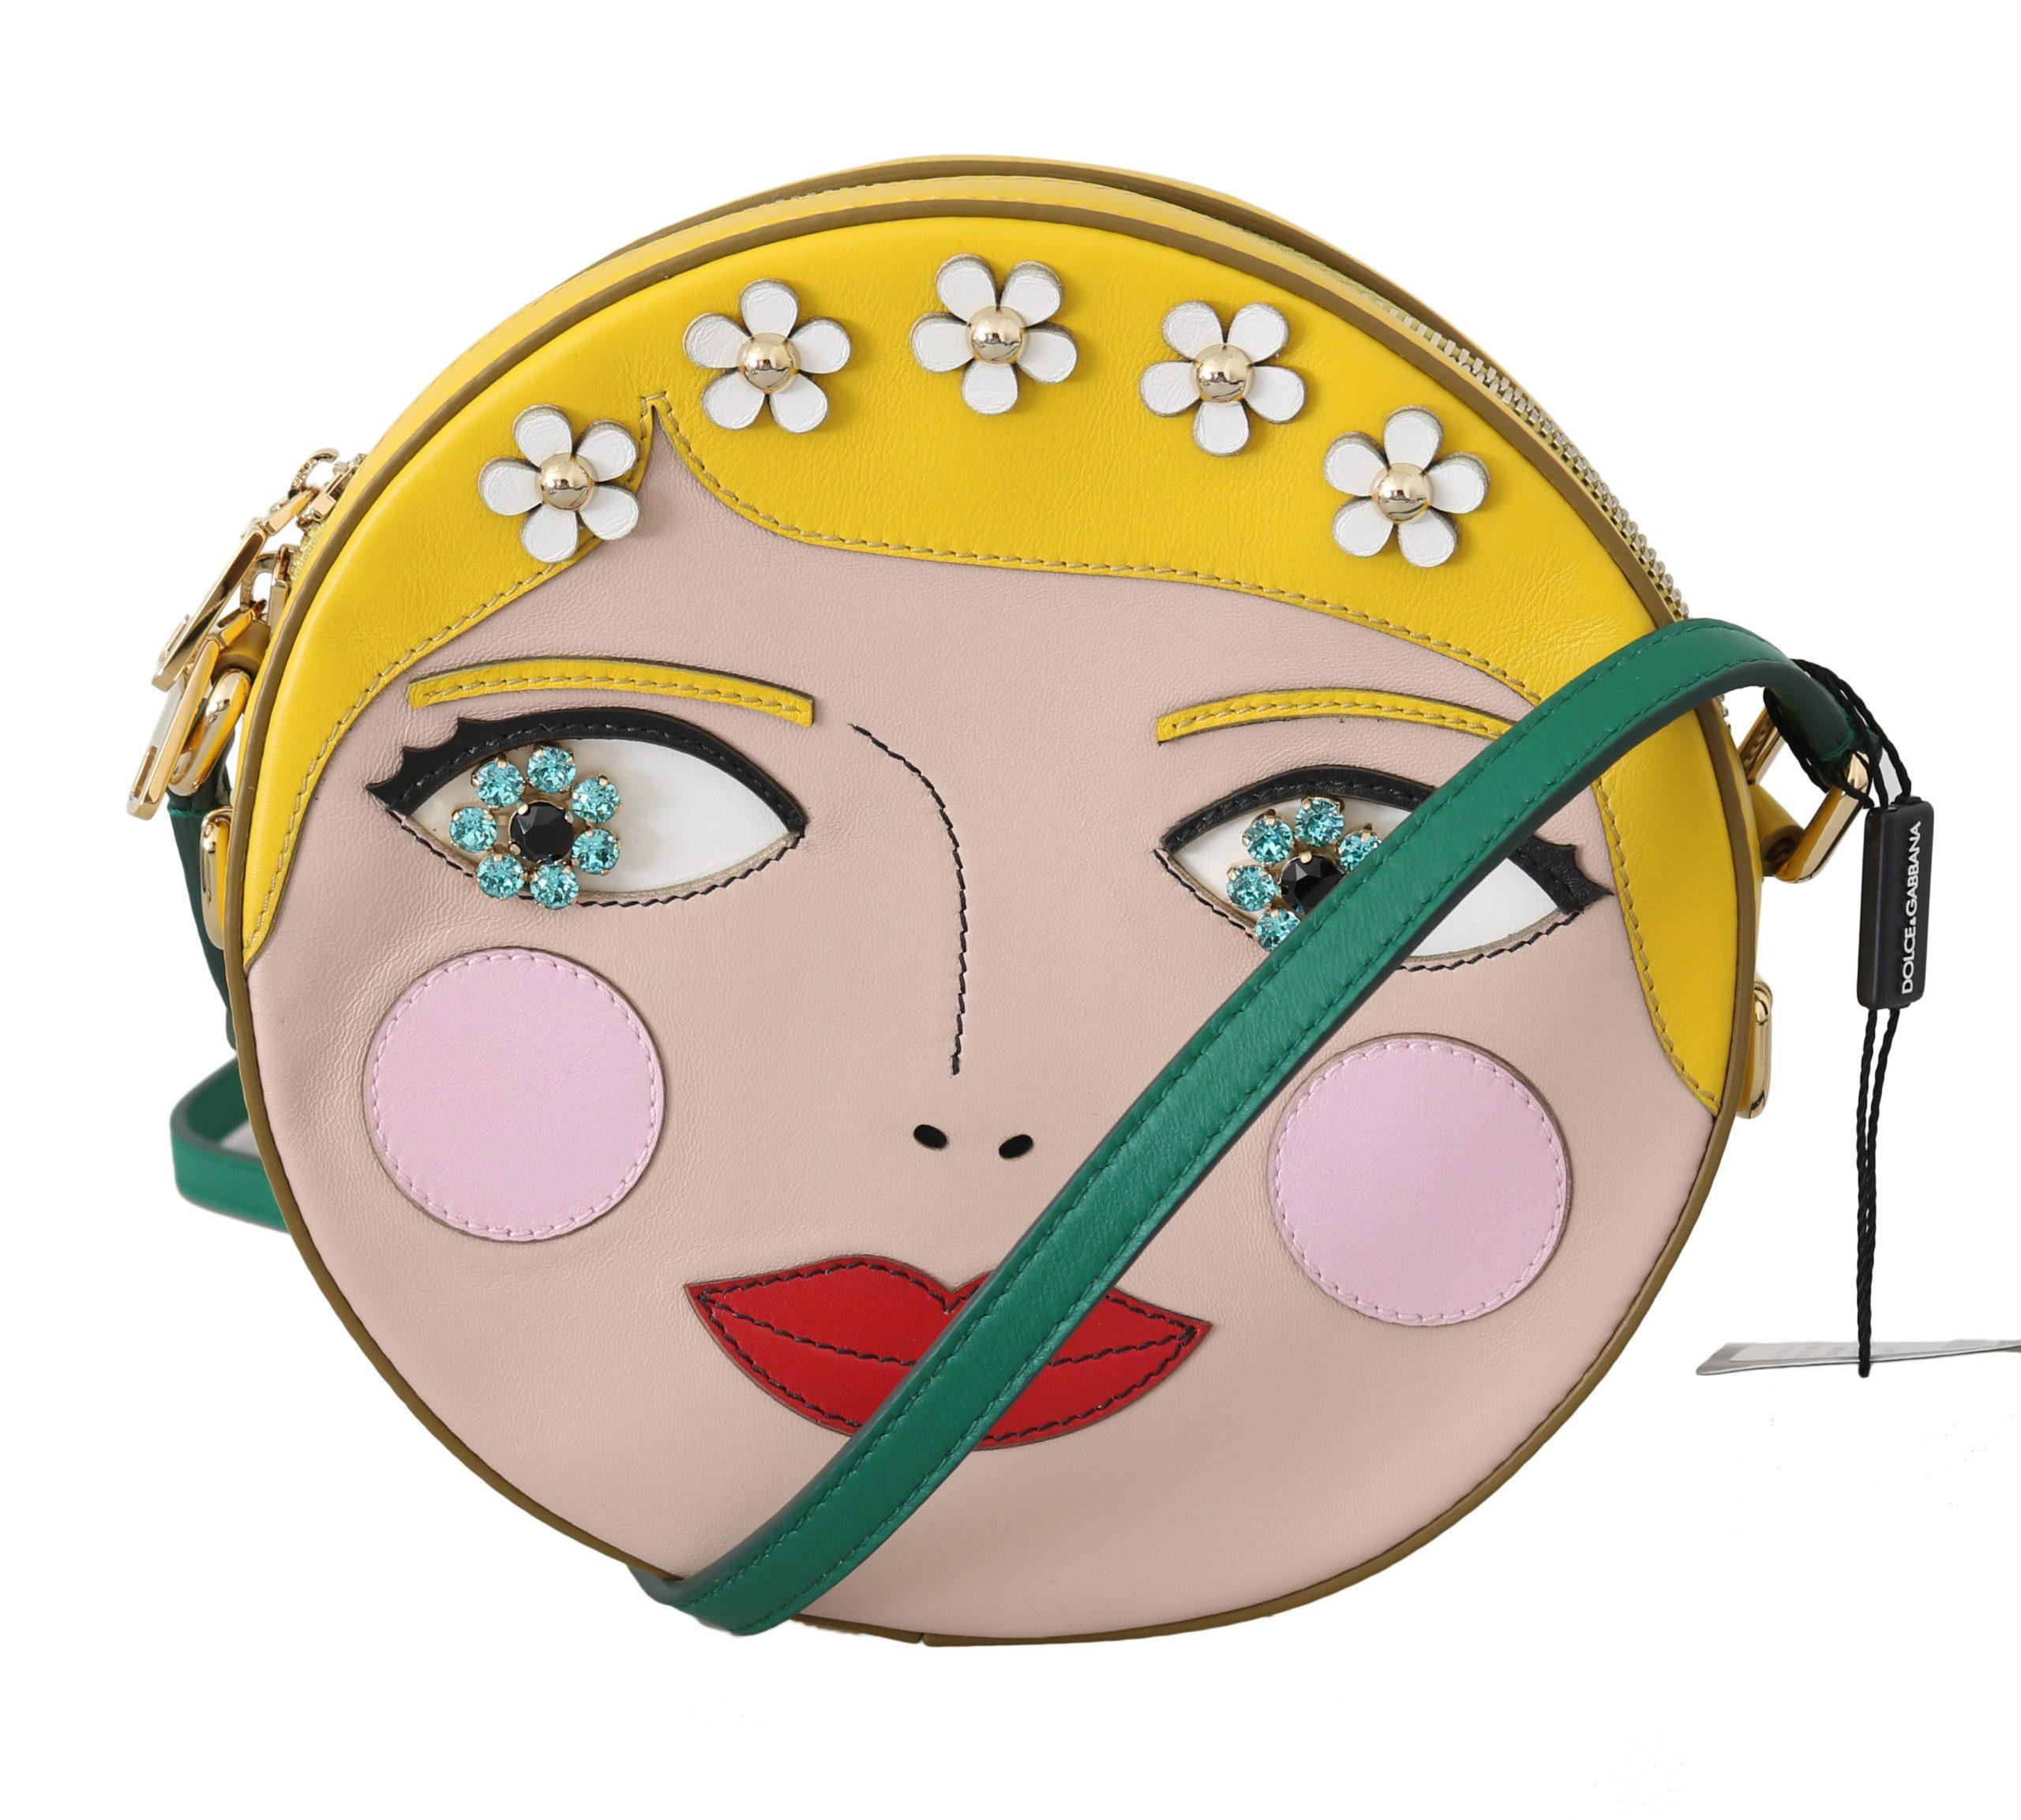 Dolce & Gabbana Women's GLAM Leather Bambola Italian Crossbody Bag Yellow VAS8704